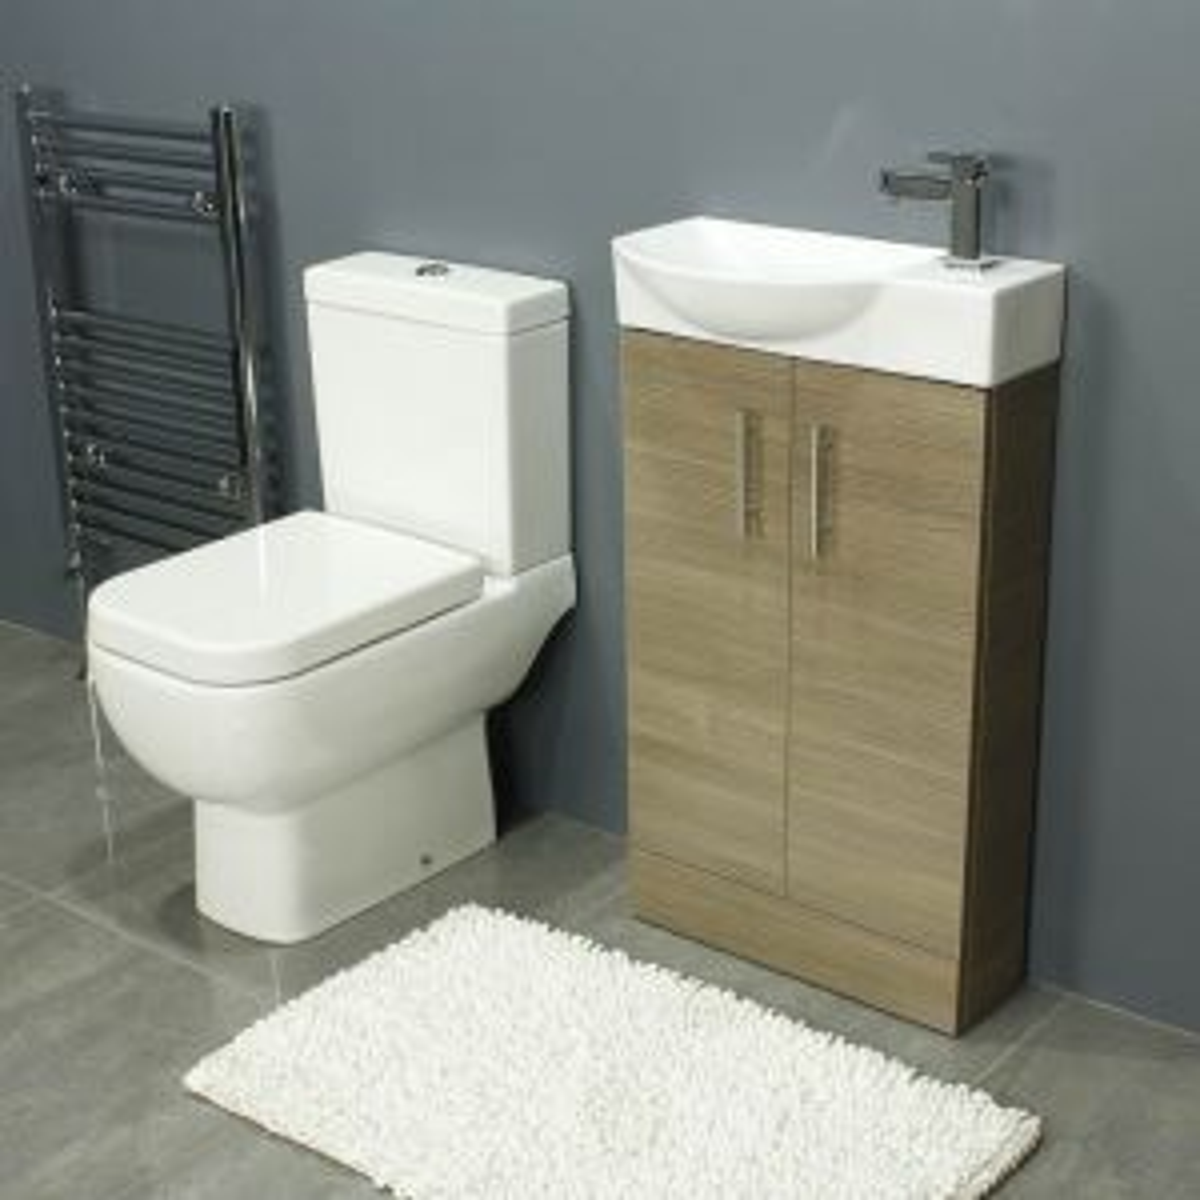 RAK Series 600 Close Coupled Toilet and 500 Series Mini Medium Oak Double Door Vanity Unit